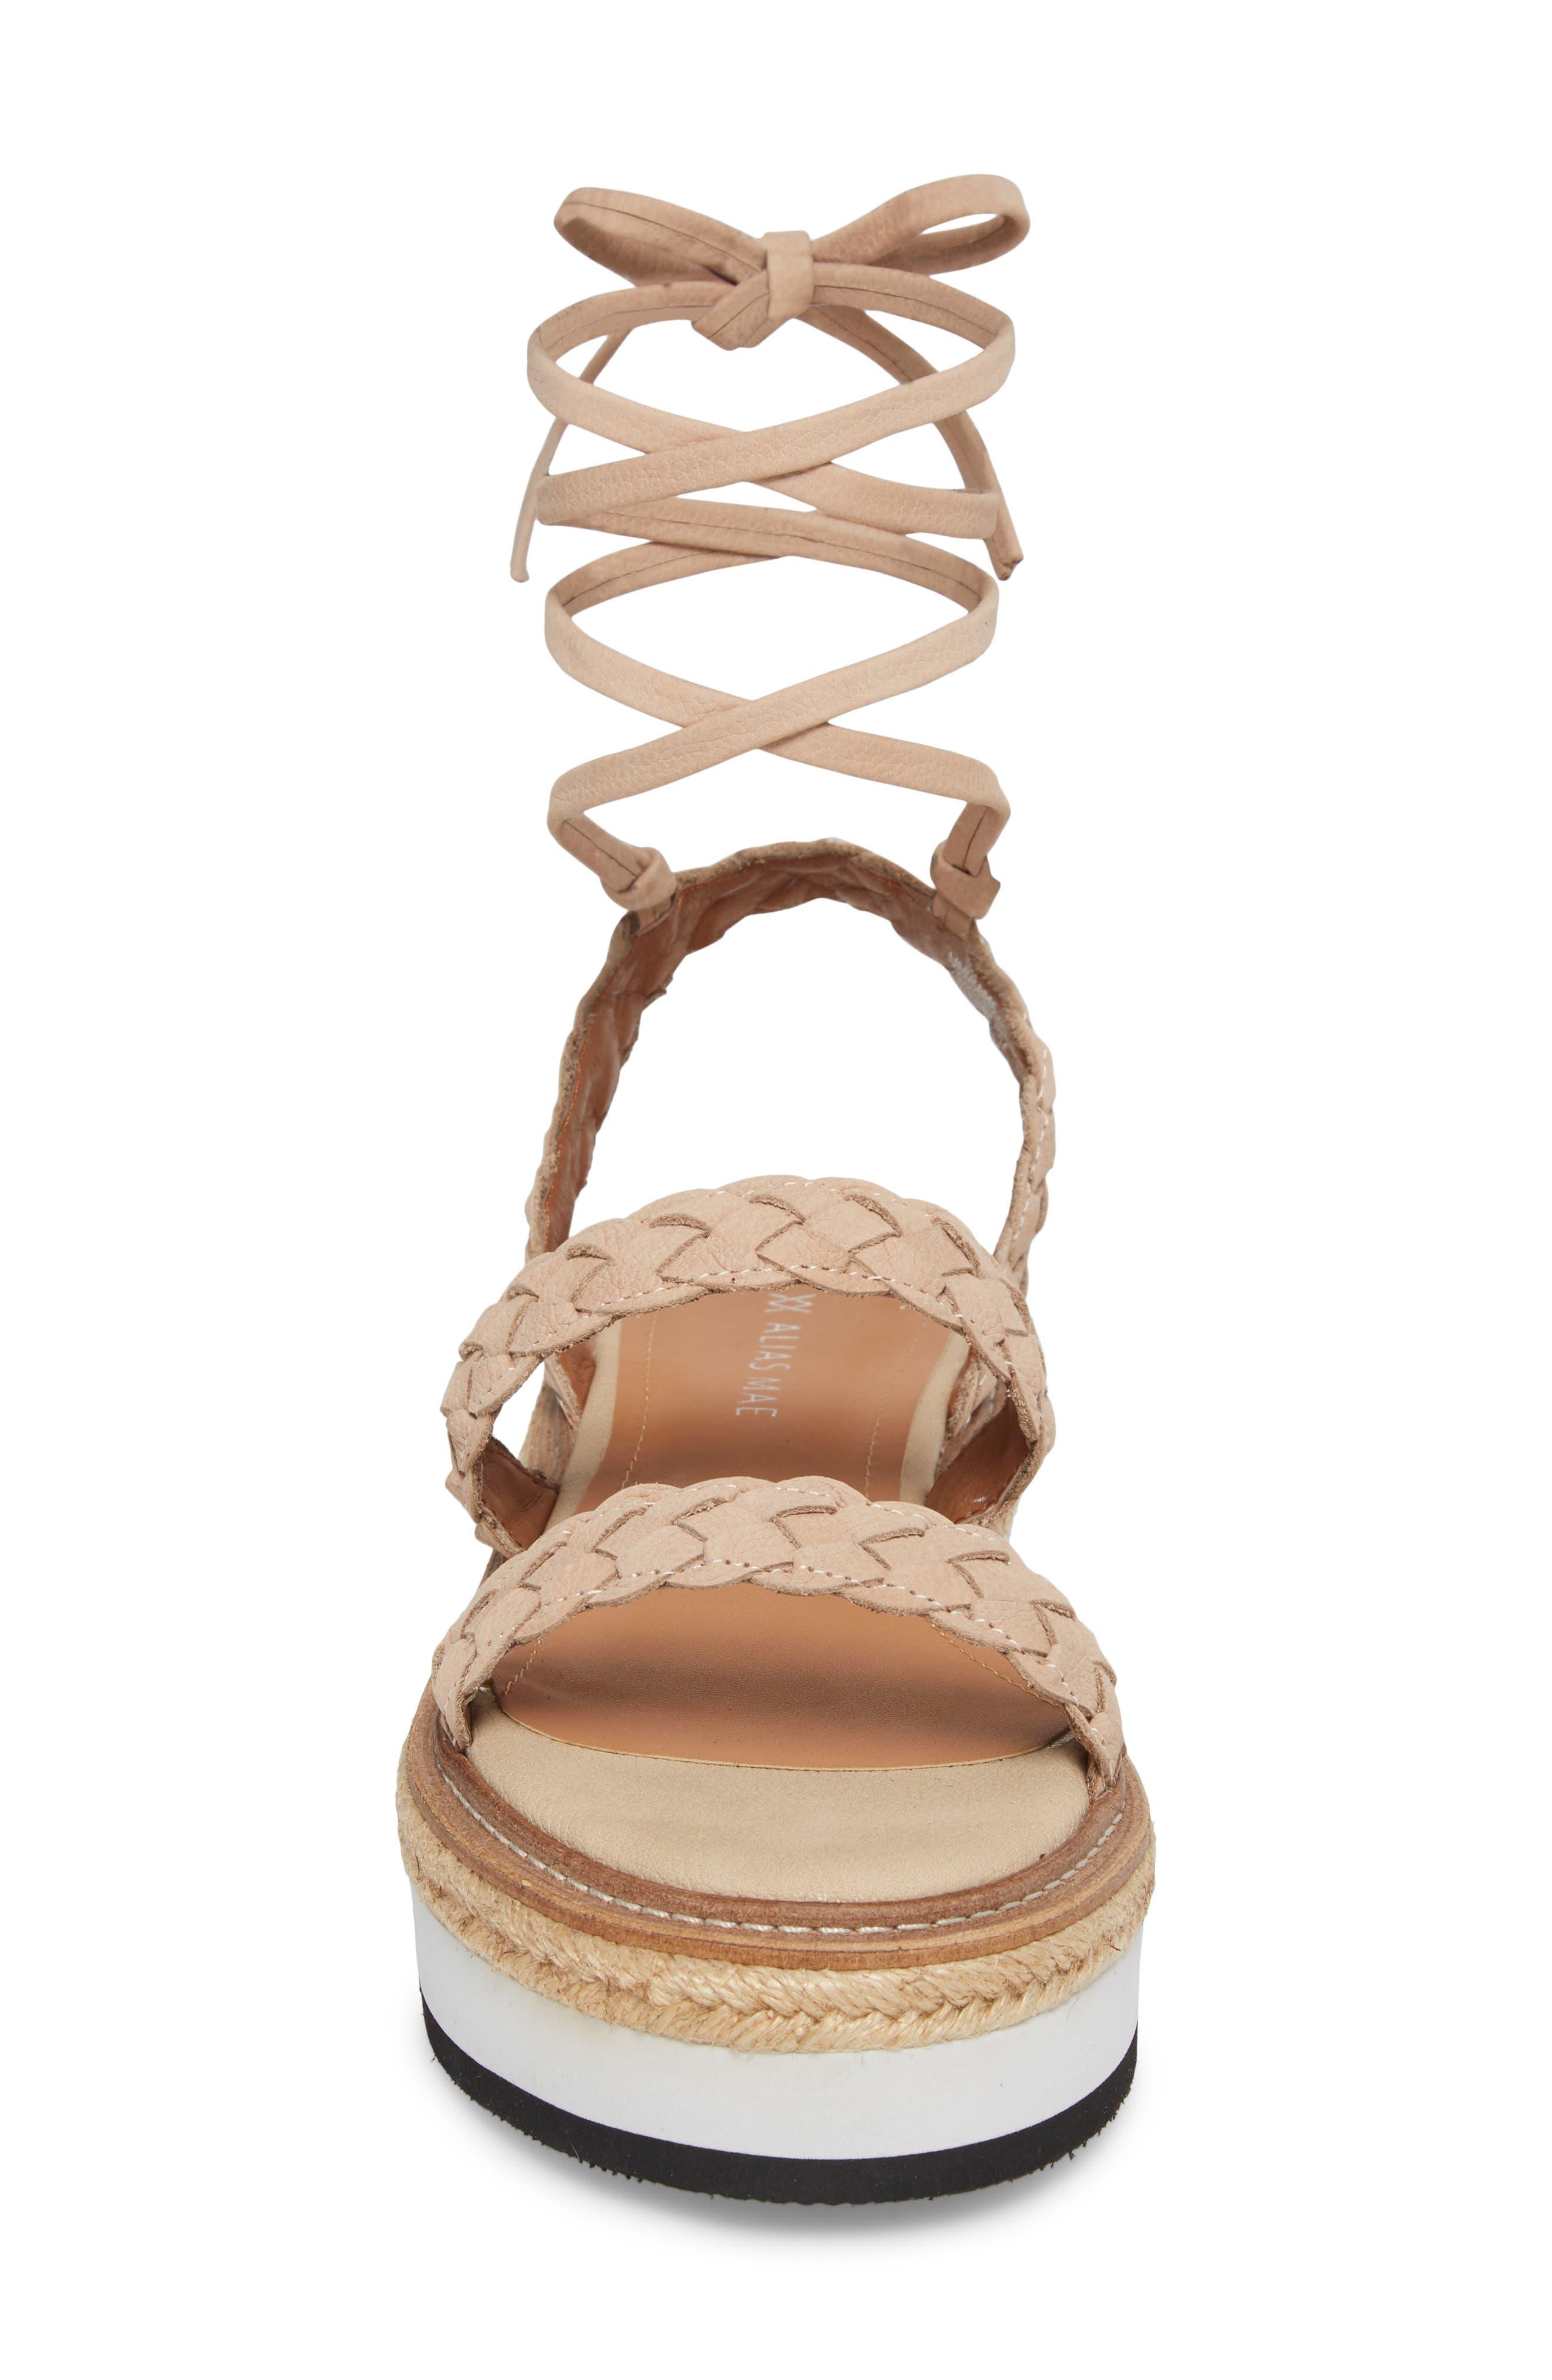 Nieve Braided Platform Sandal,                             Alternate thumbnail 5, color,                             Natural Leather